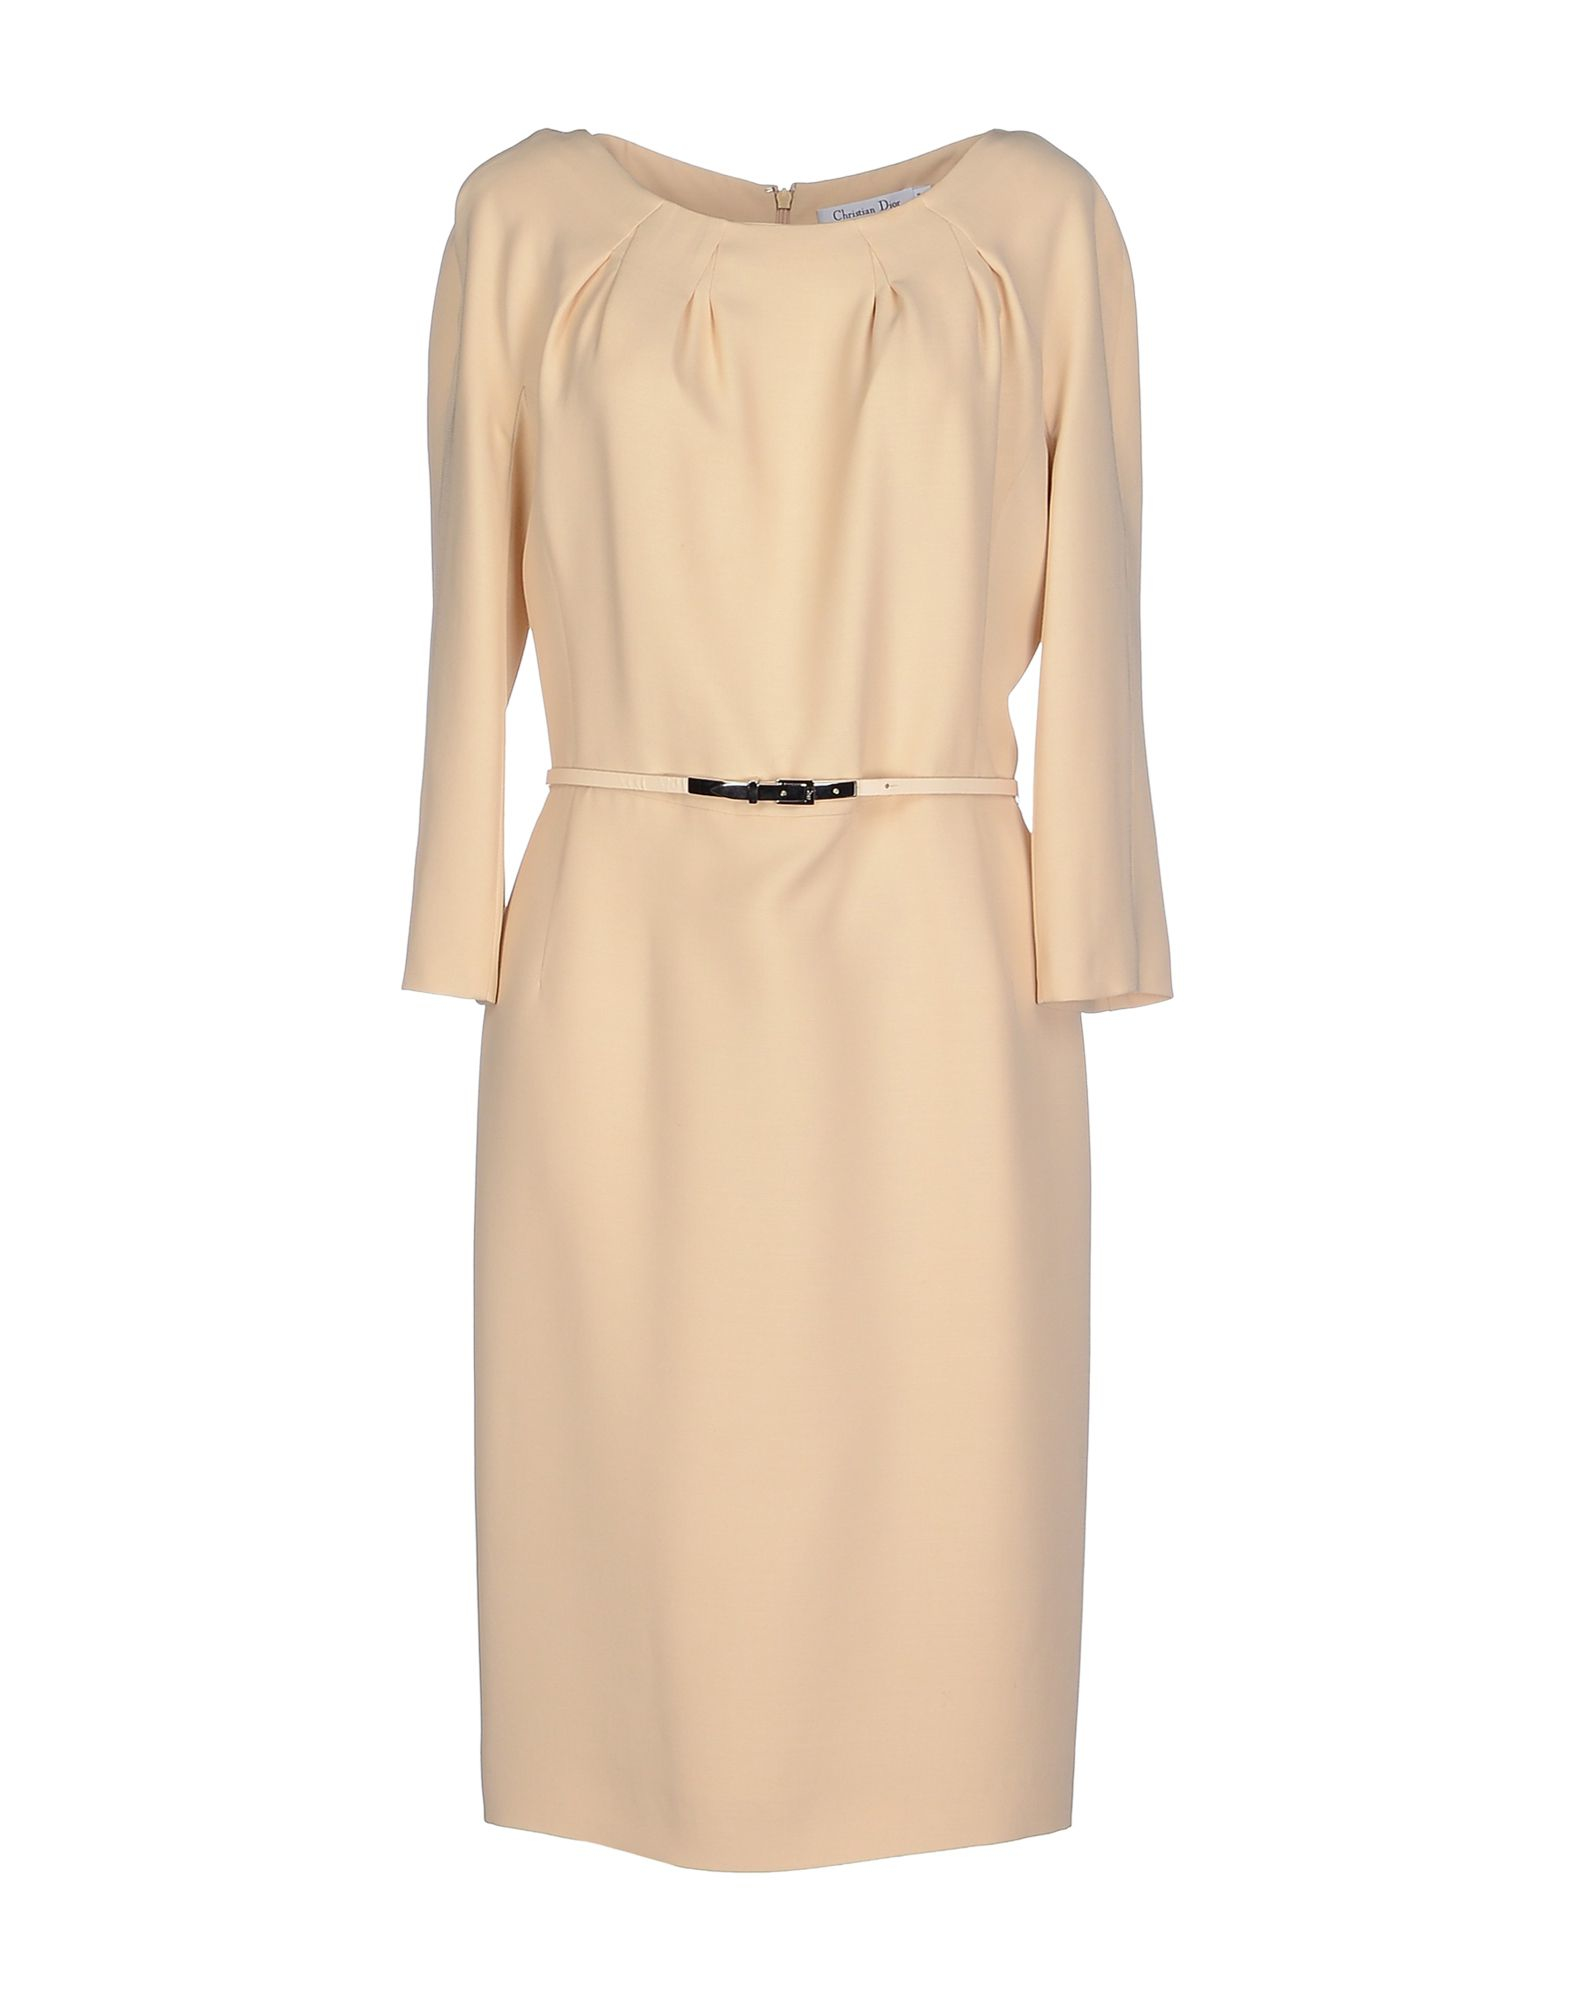 dior short dresses - photo #49